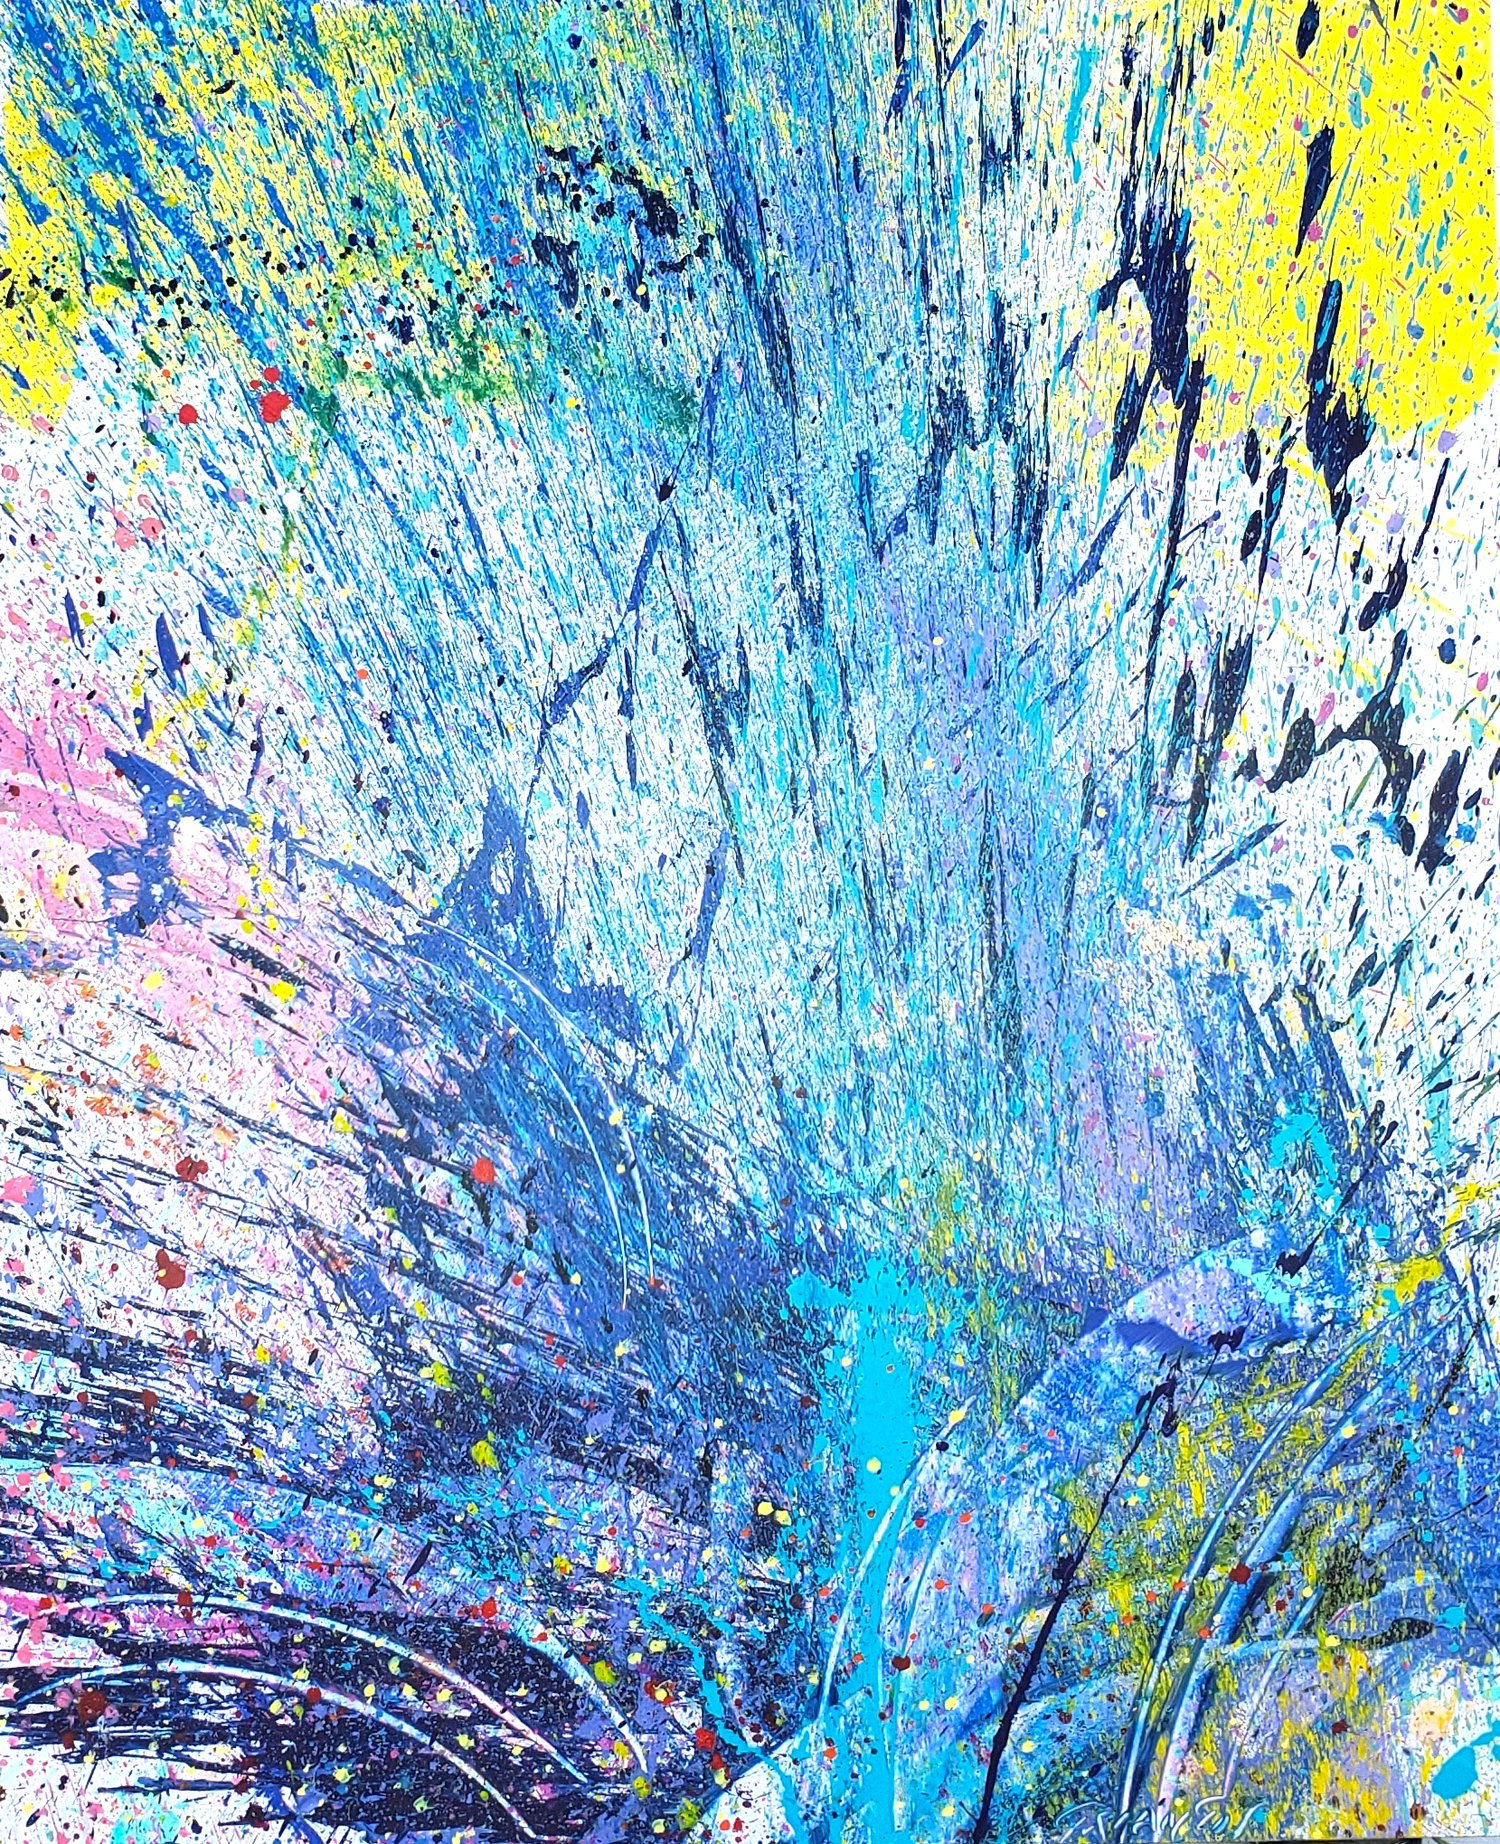 "Napa Valley #103, 2019, acrylic on canvas, 72"" x 60"" (183 x 152.4cm)"